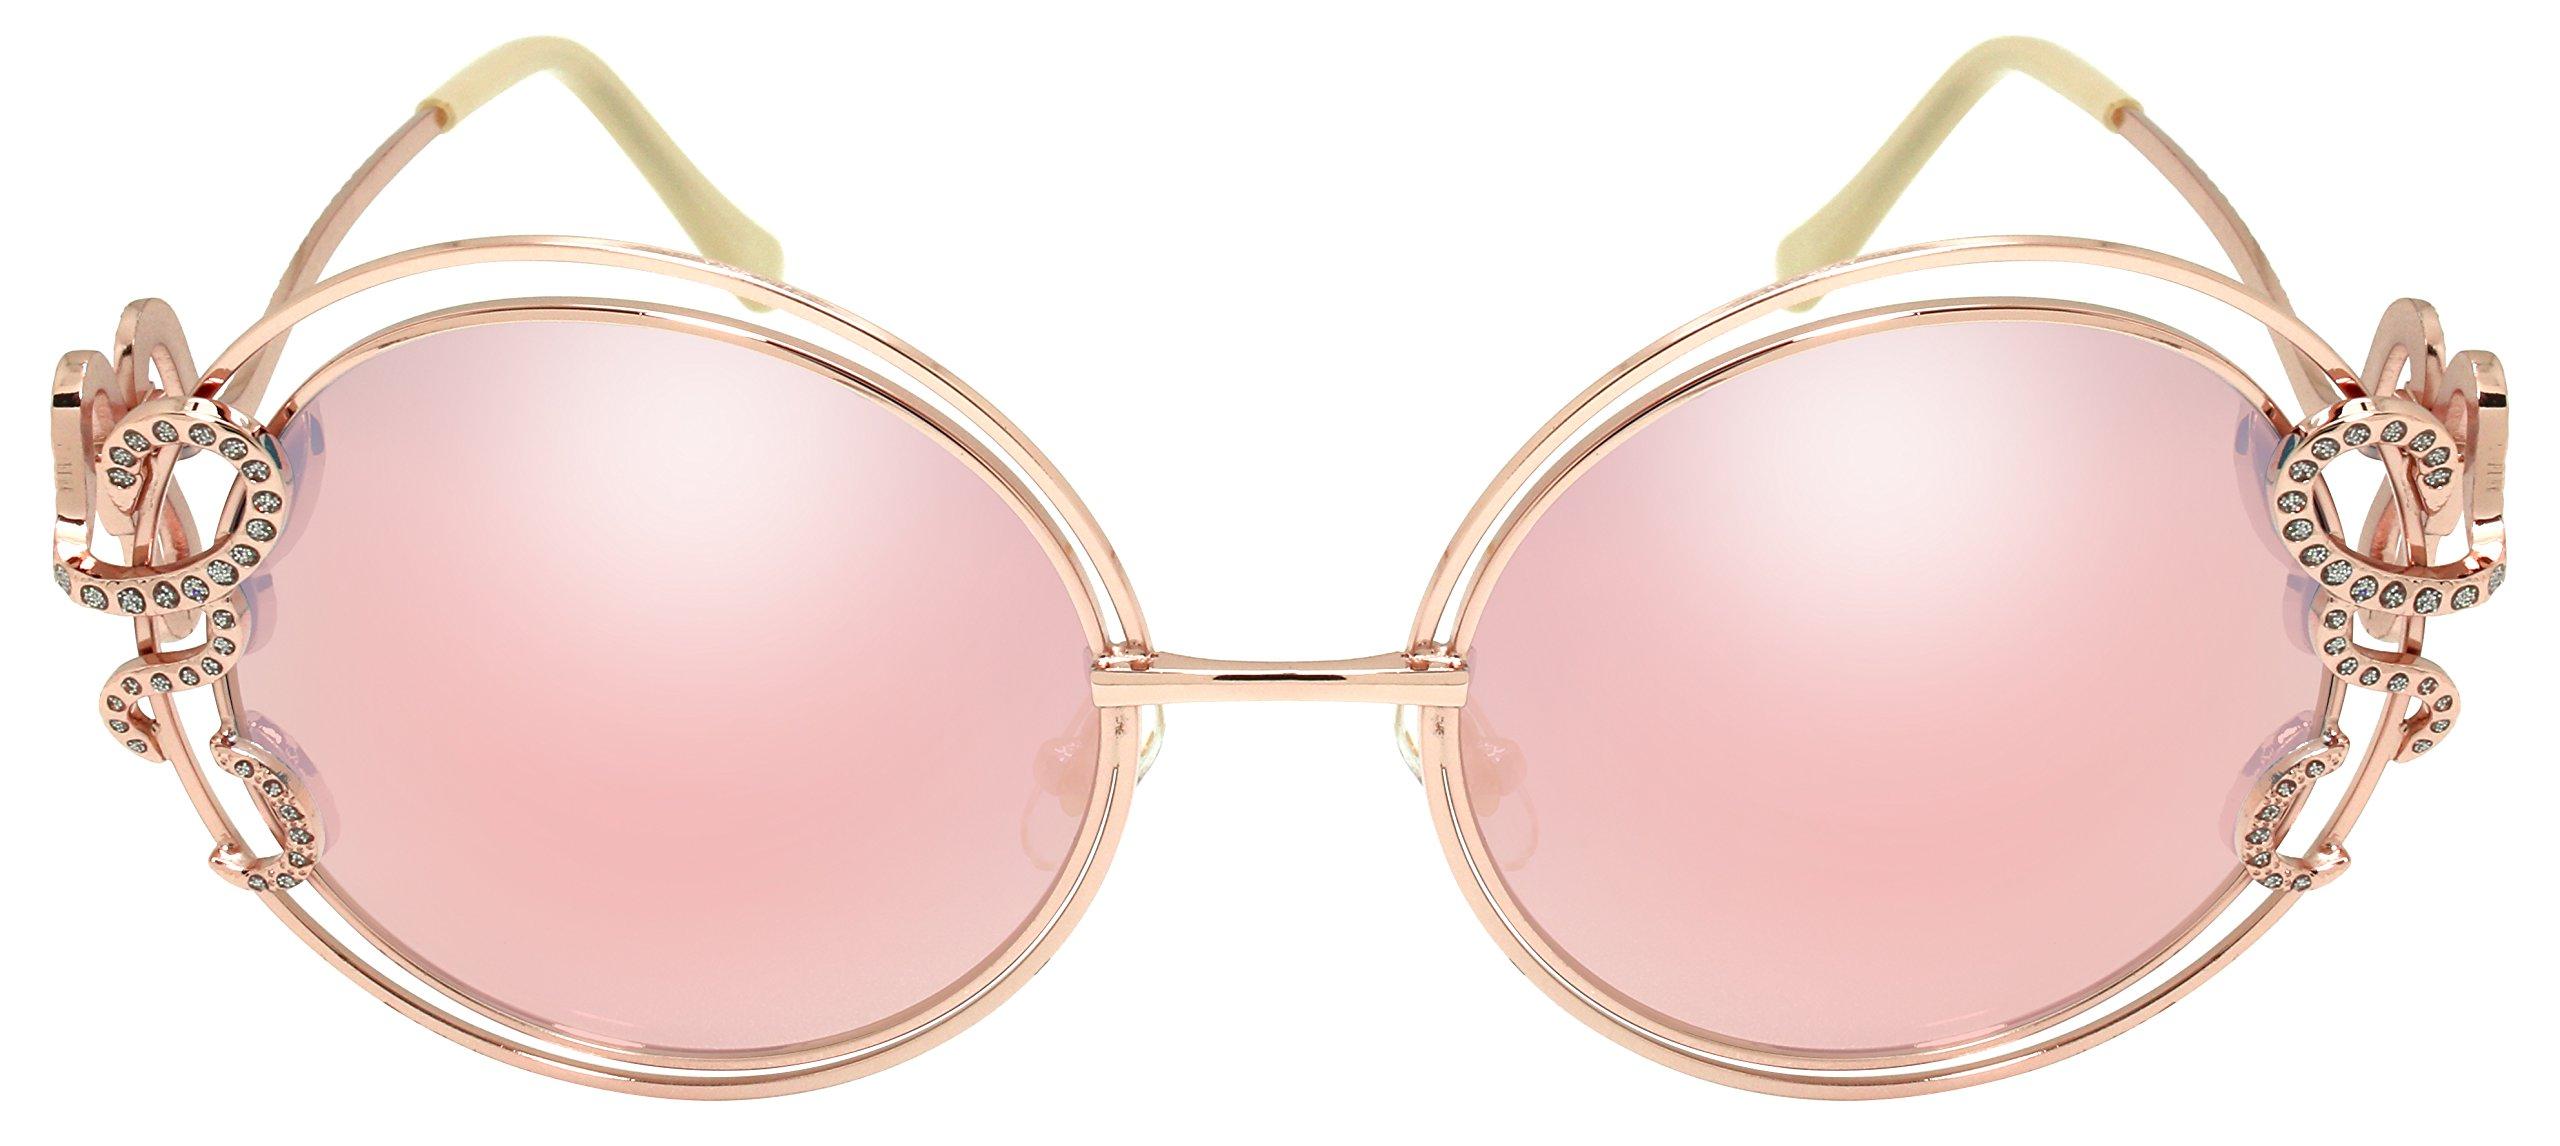 Edge I-Wear Fashion Round Rhinestone Women Sunglasses w/Mirrored Lenses 3195R-REV-4(pkrev)